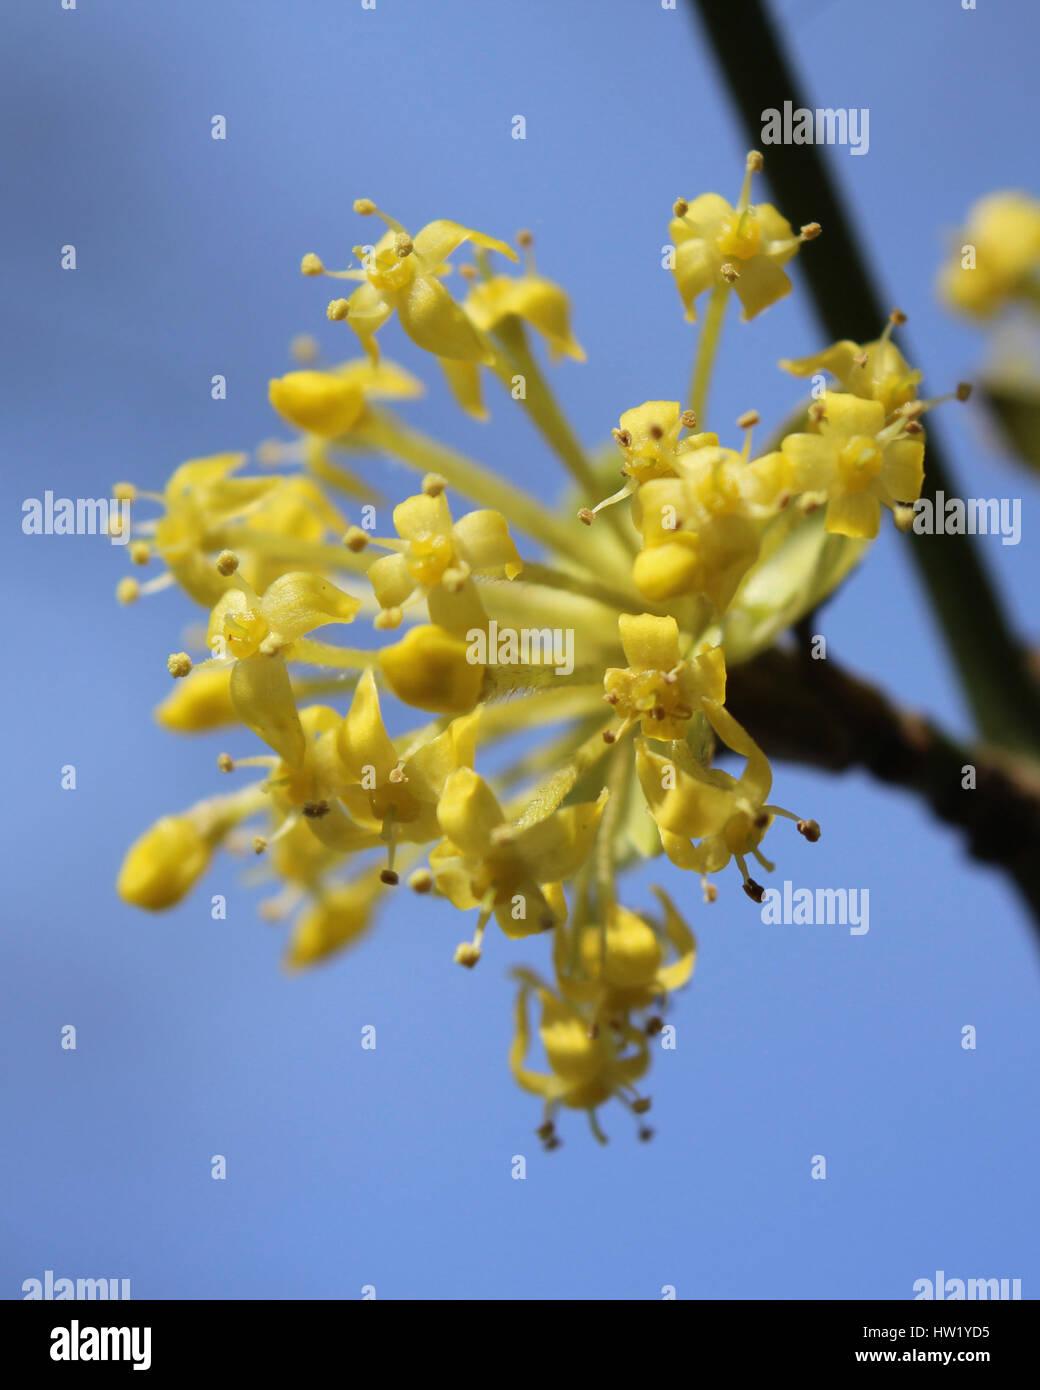 The early bright yellow flowers of Cornus mas also known as Cornelian cherry, European cornel or Cornelian cherry Stock Photo